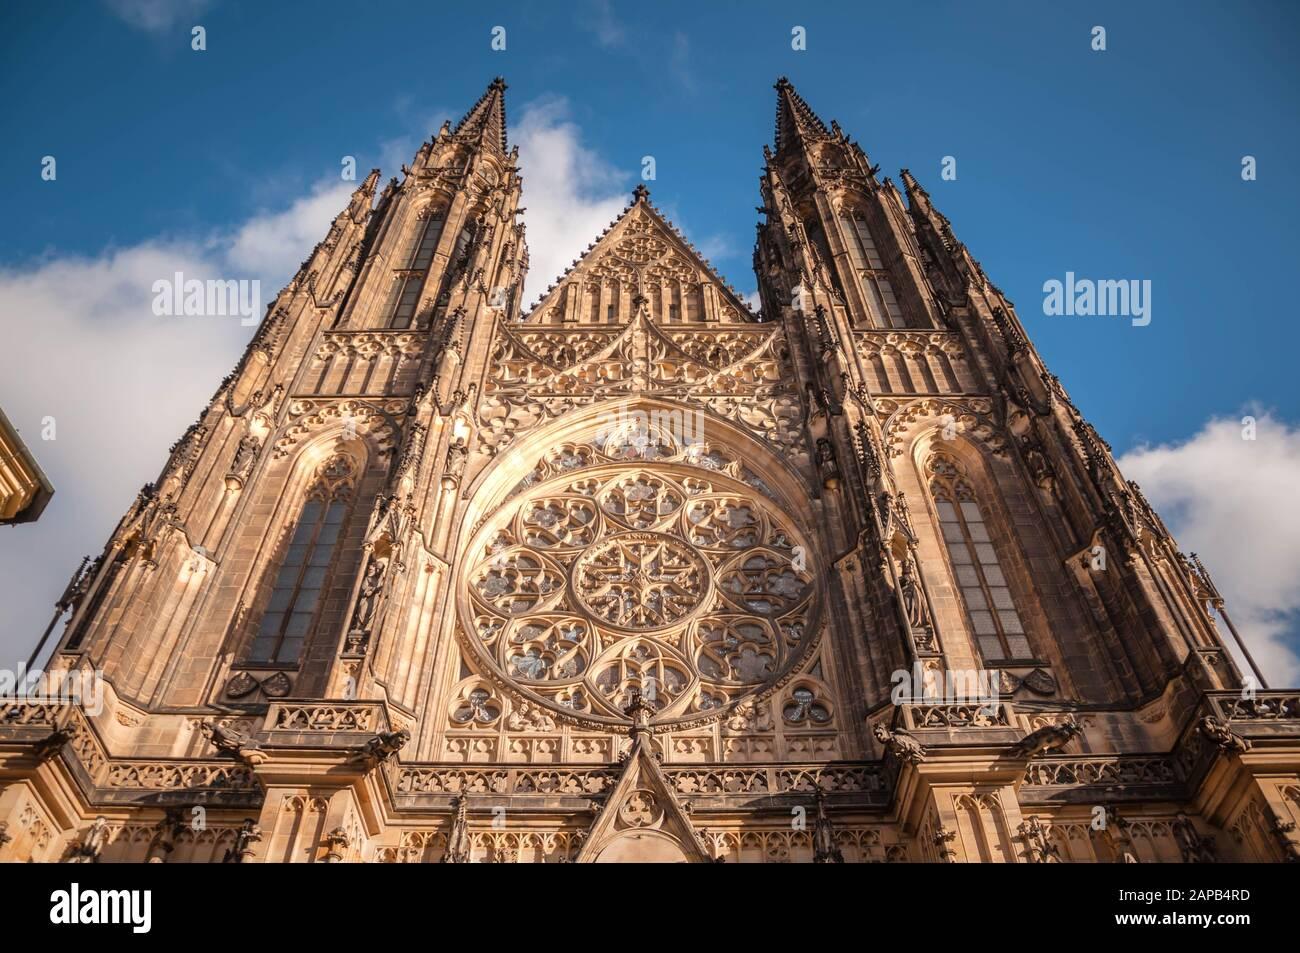 Praga, República Checa 1/5/2020: Catedral De San Vito, Entrada Principal. Foto de stock